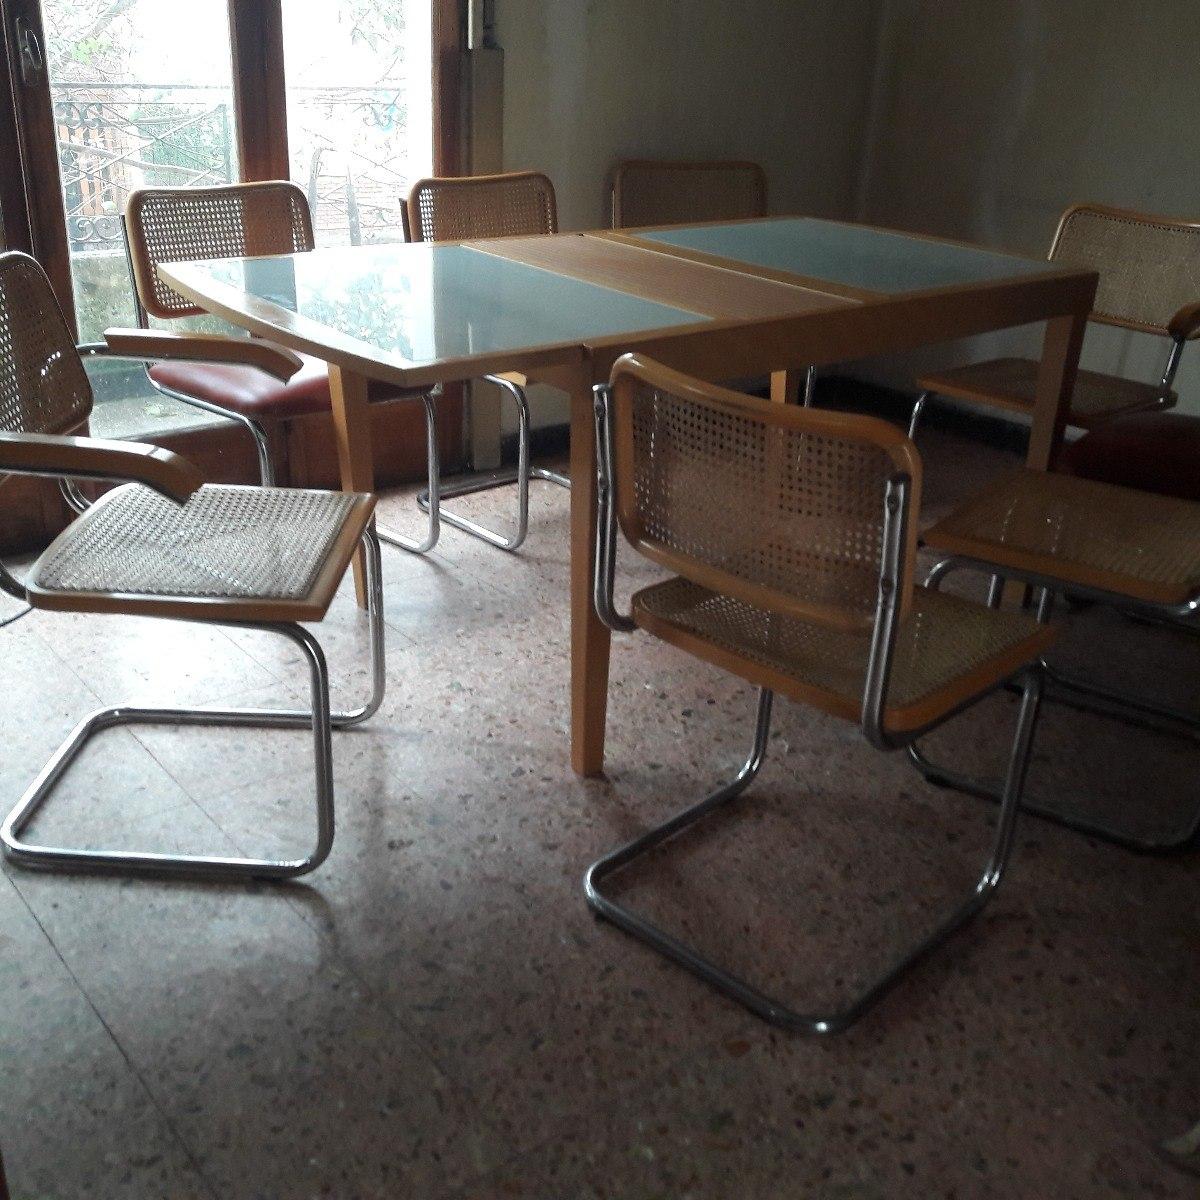 Ideal 000 00 Sillas Bauhaus Retro30 Cesca Breuer Oficina Mesa Comedor R54c3jqAL